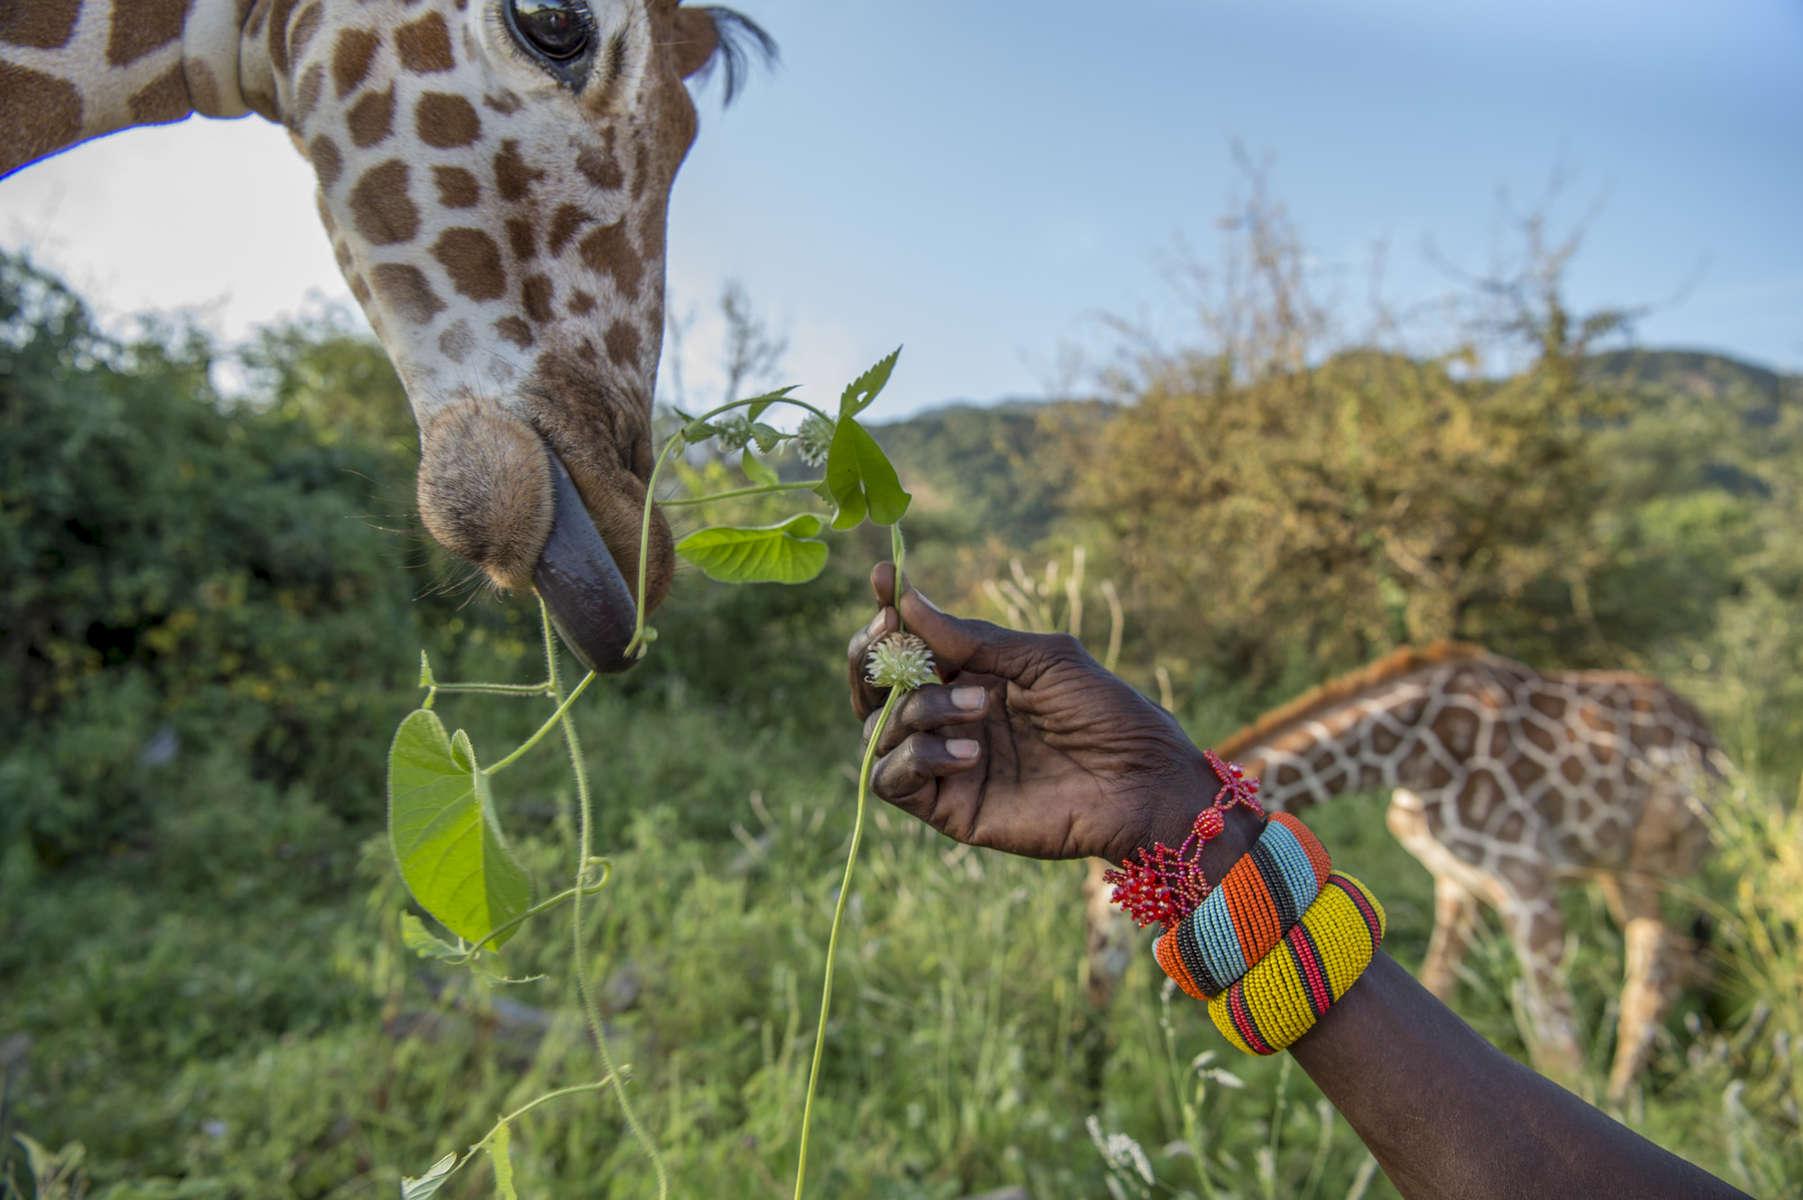 Reticulated giraffe at Sarara Camp